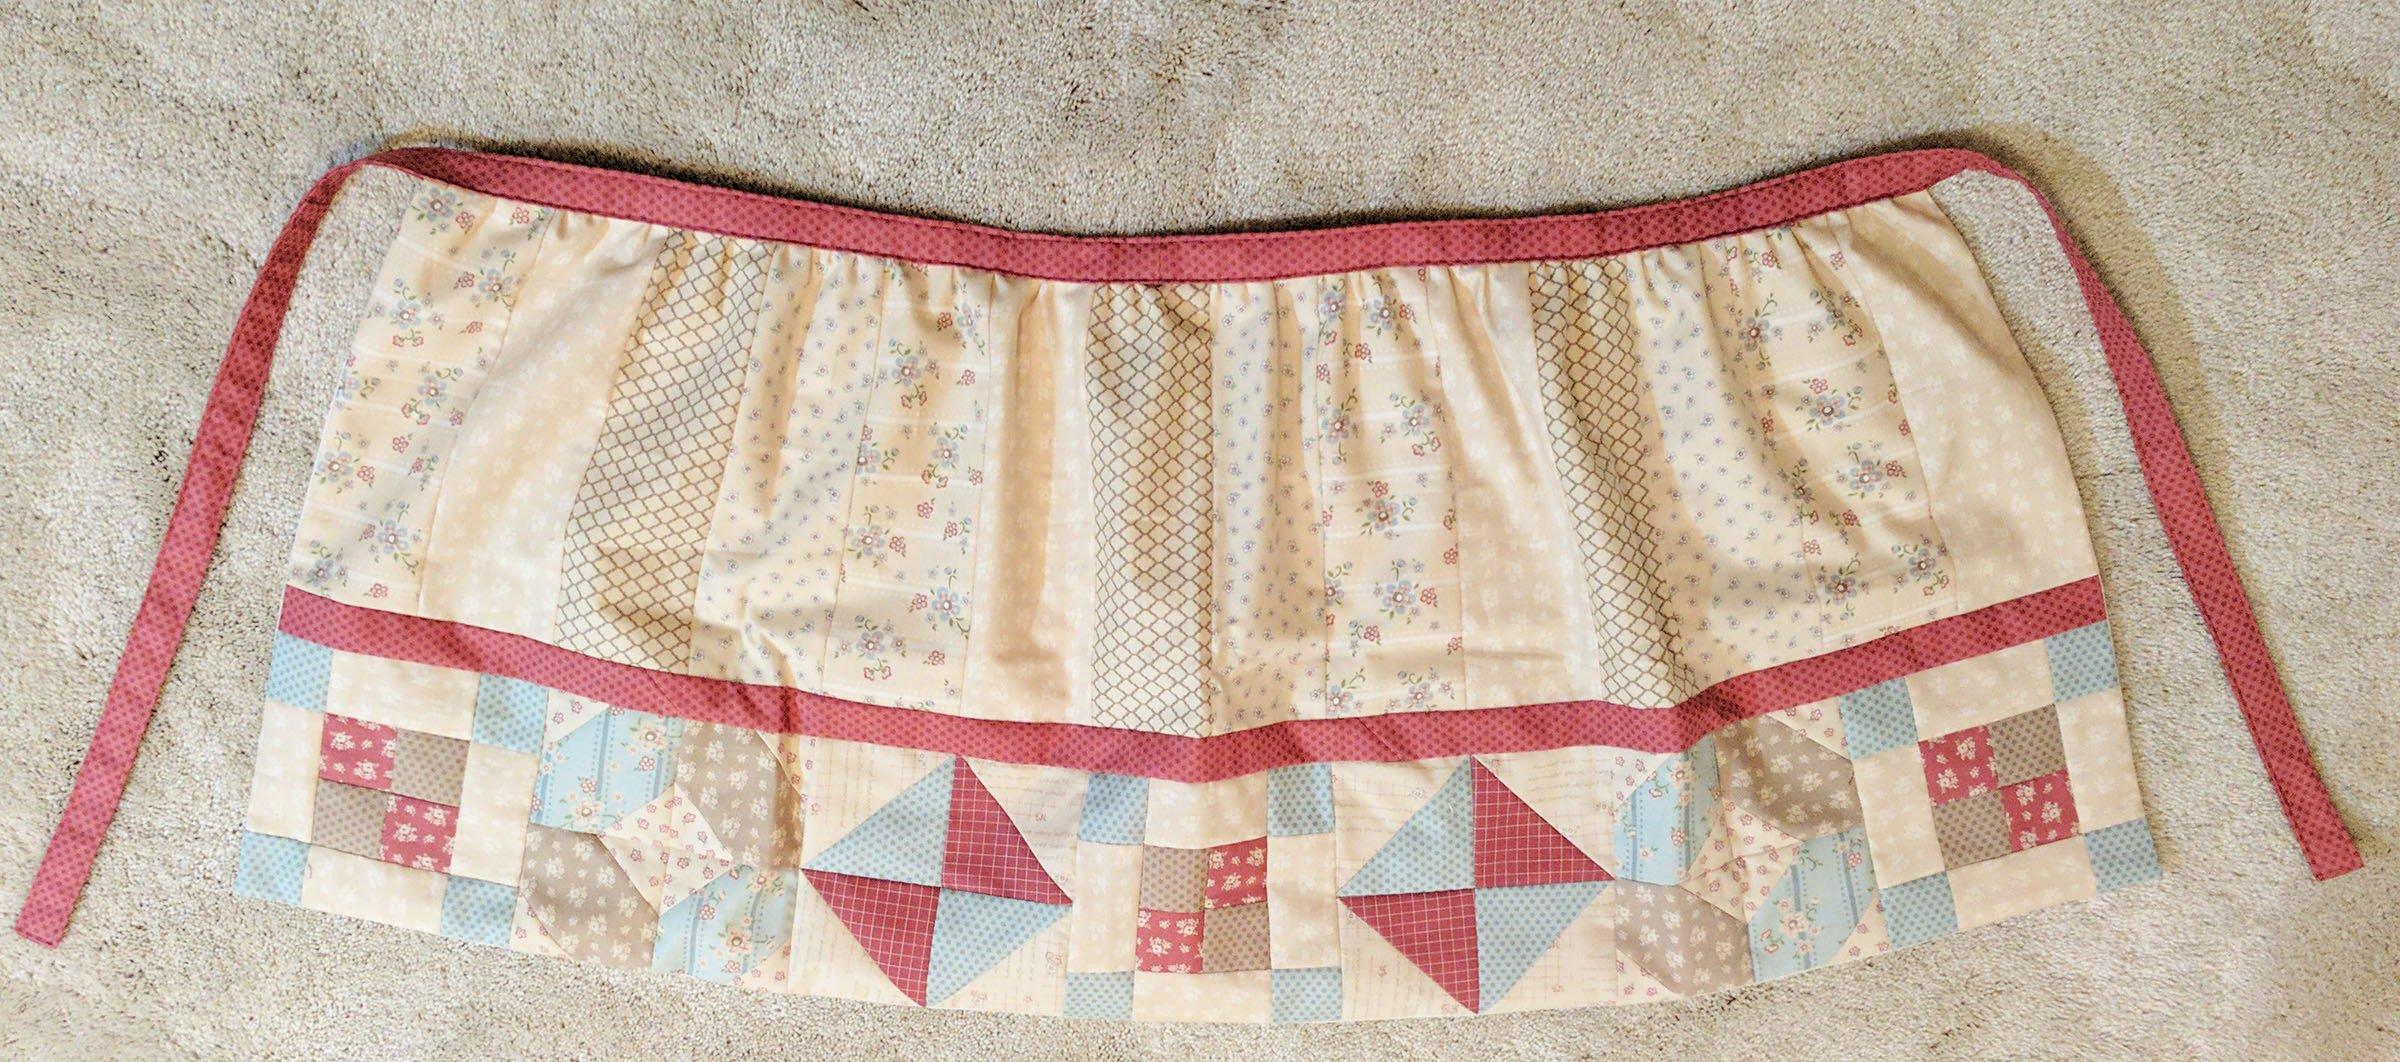 sugar-cookies-apron-pattern